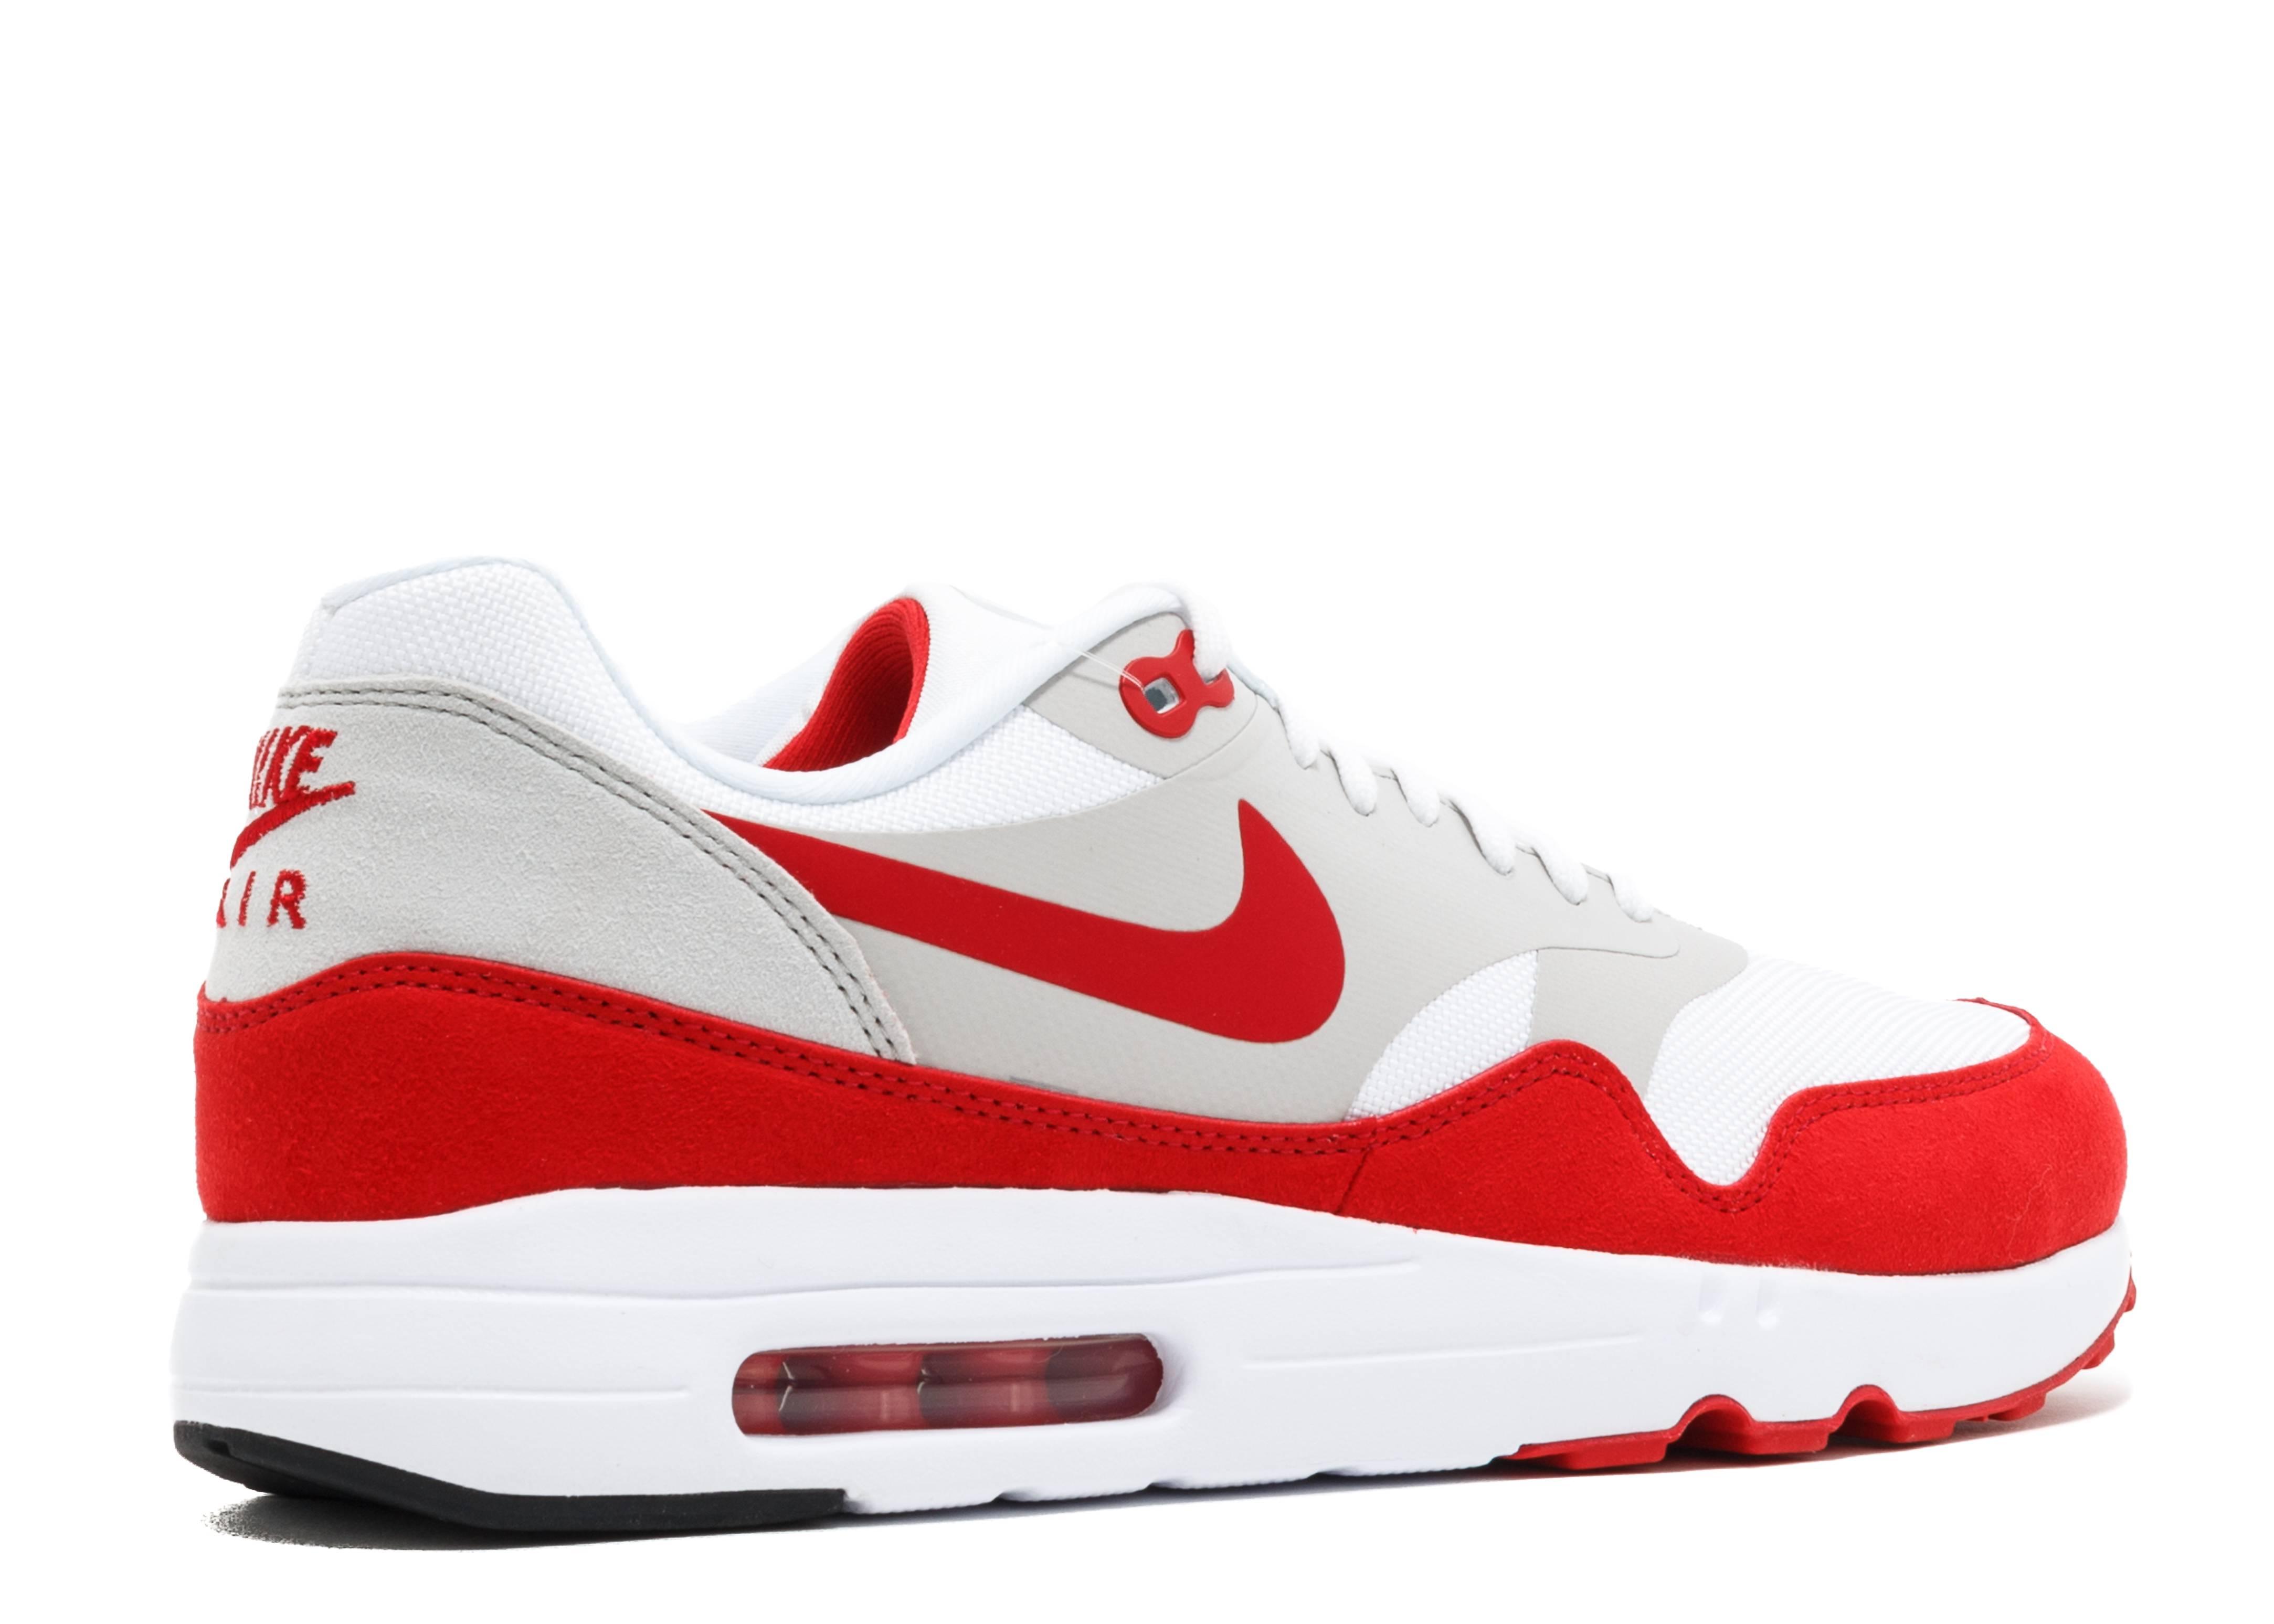 39c55d4447 Air Max 1 Ultra 2.0 Le - Nike - 908091 100 - white/university red | Flight  Club